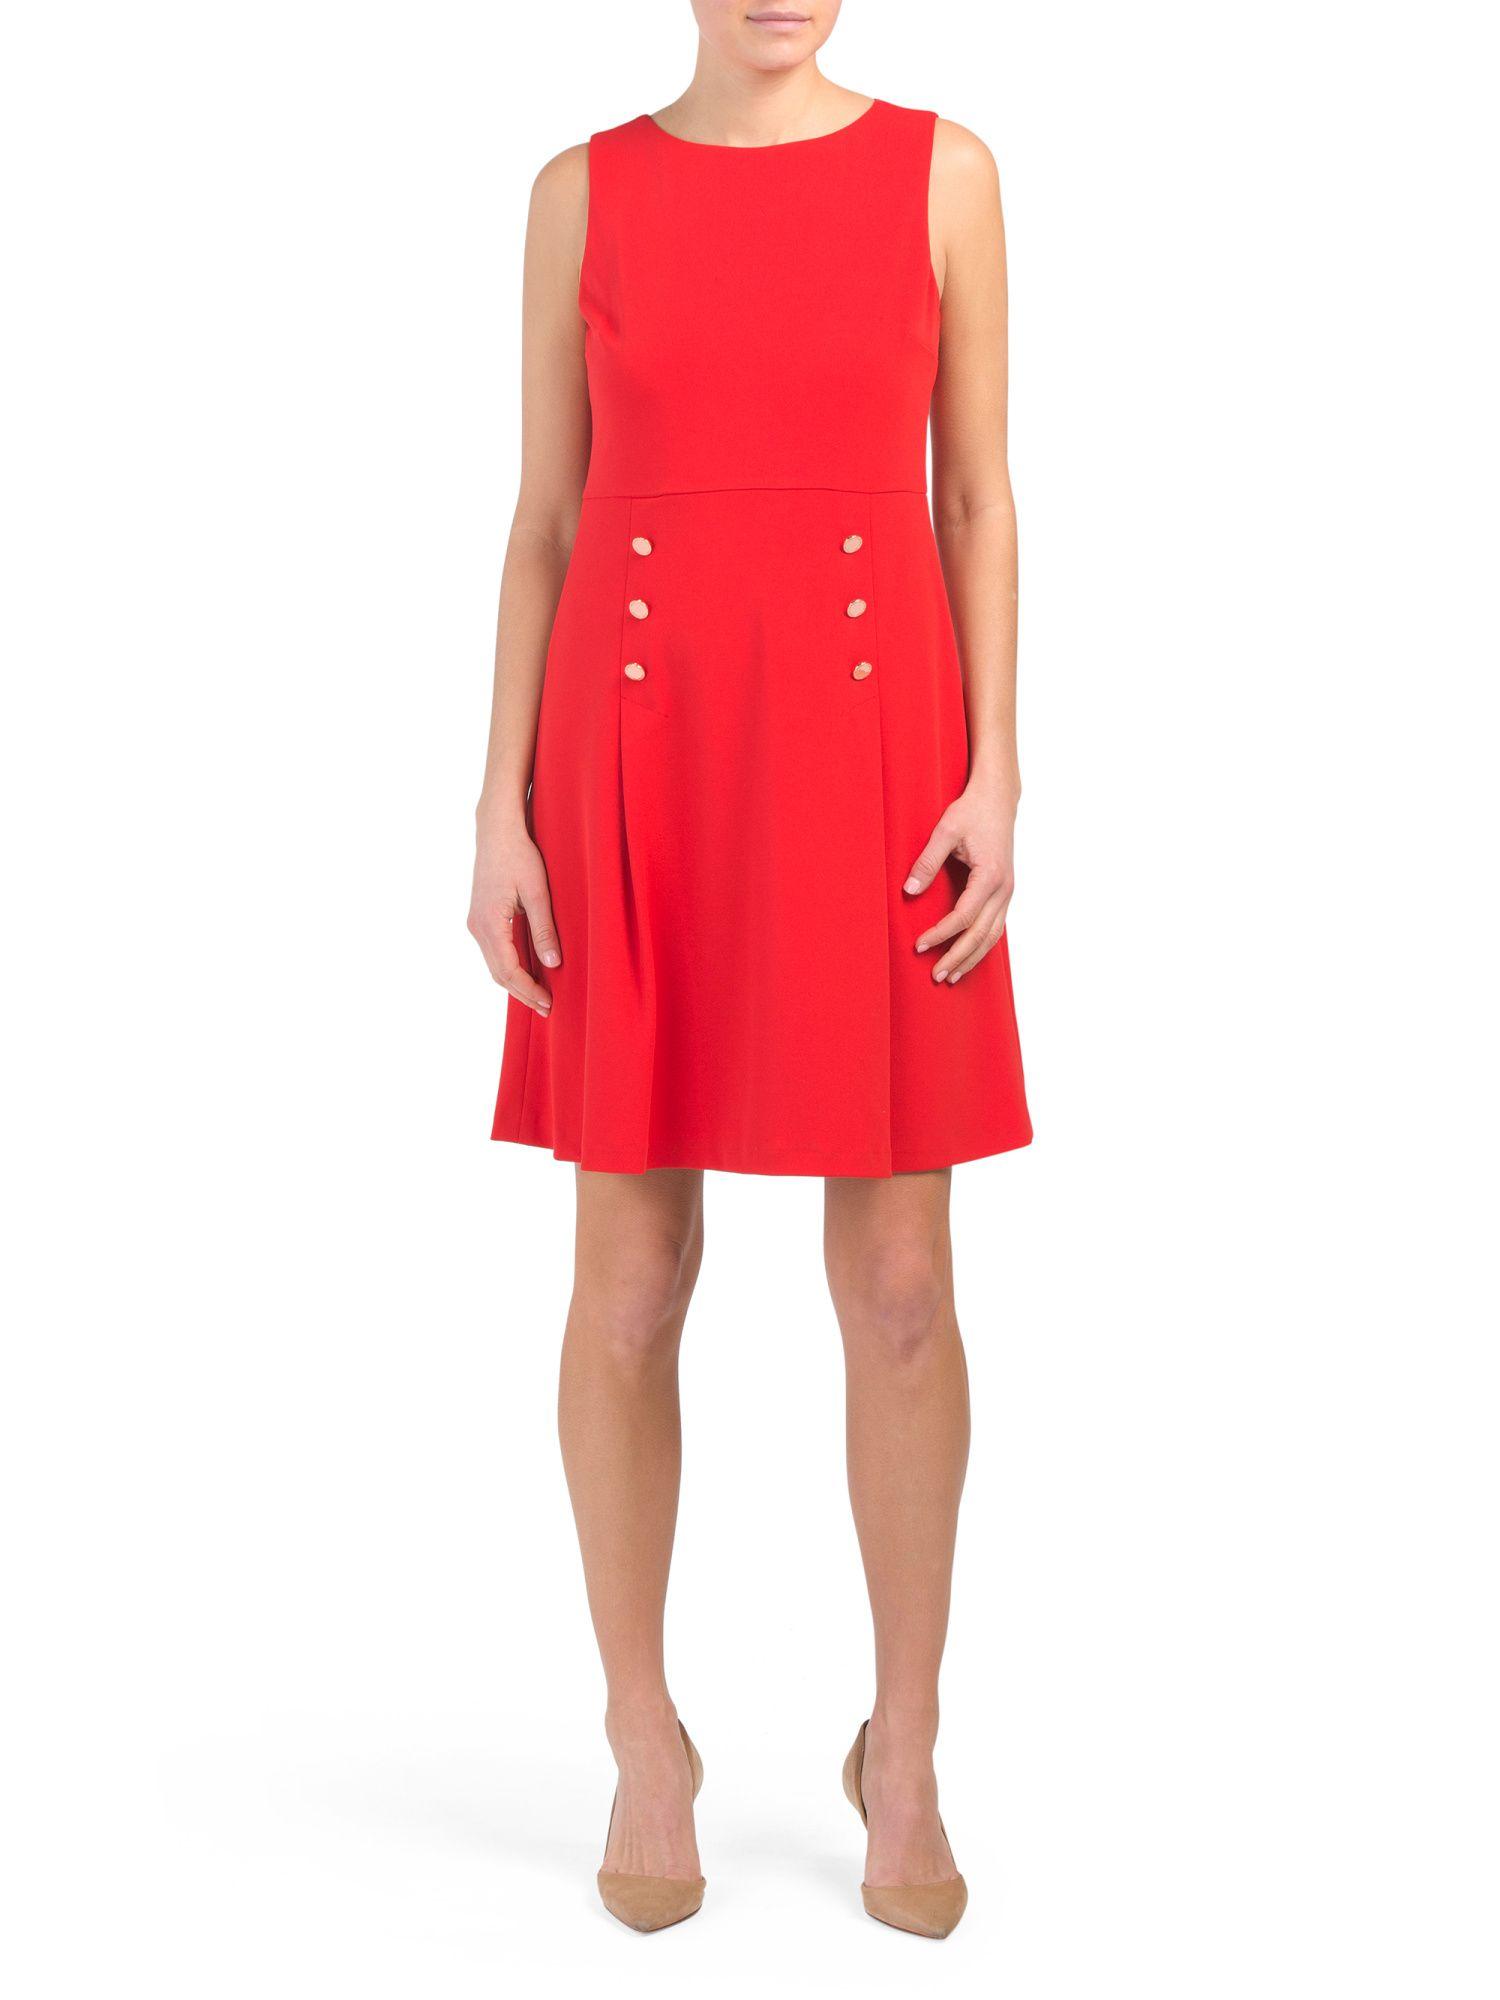 5db23e17d5ce Scuba Crepe Dress With Buttons - New Arrivals - T.J.Maxx | DRESS for ...